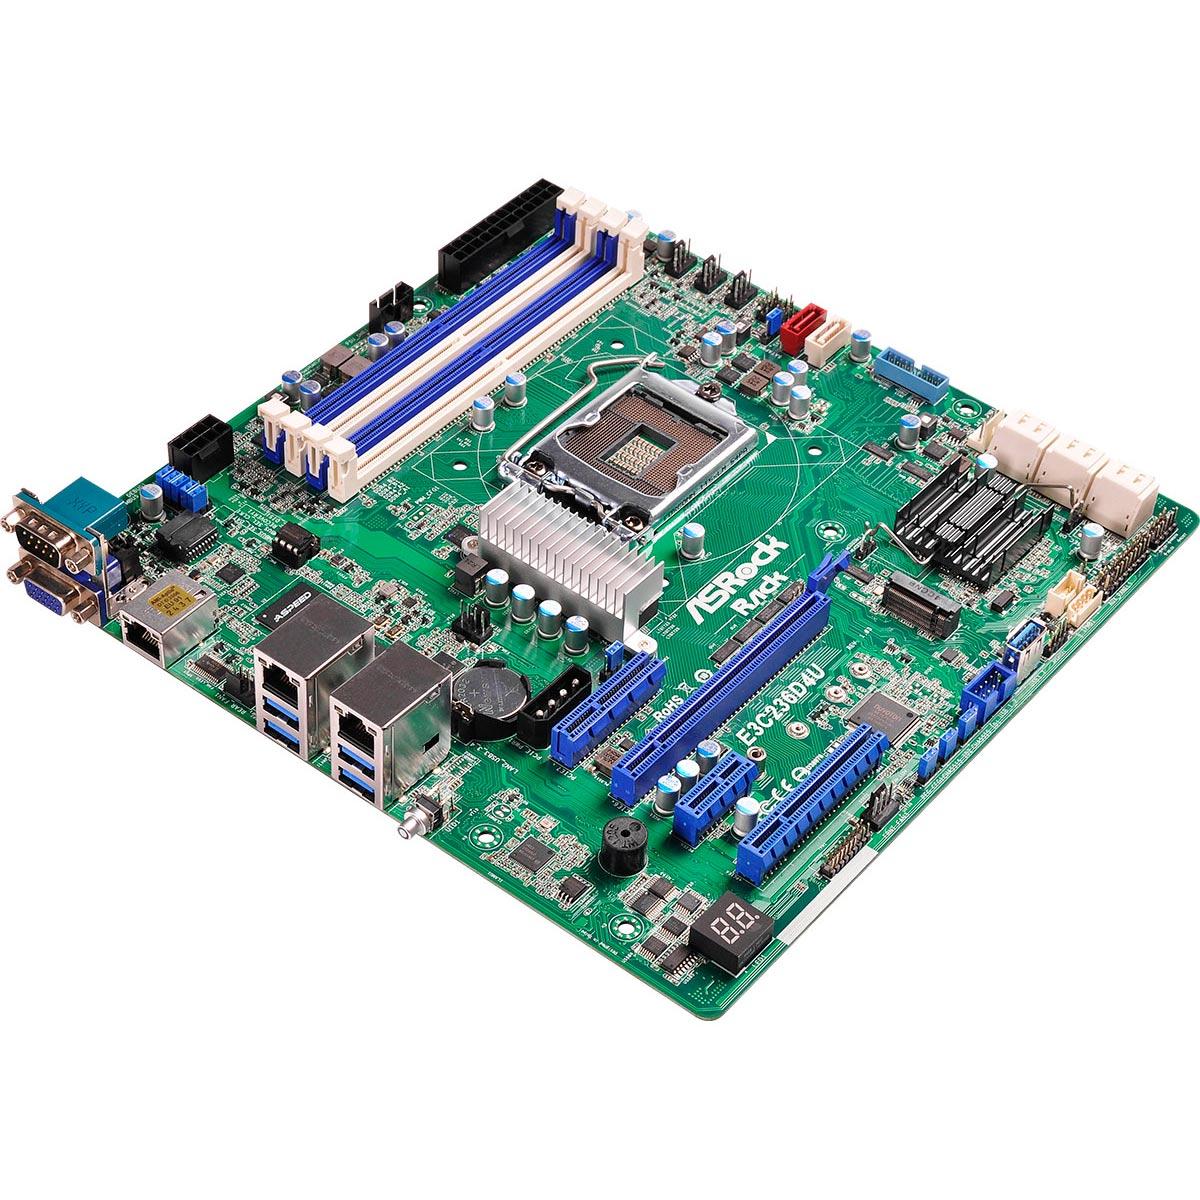 Carte mère ASRock E3C236D4U Carte mère Micro ATX Socket 1151 Intel C236 - SATA 6Gb/s - M.2 - 1x PCI Express 3.0 16x - 2x Gigabit LAN + 1 RJ45 Management